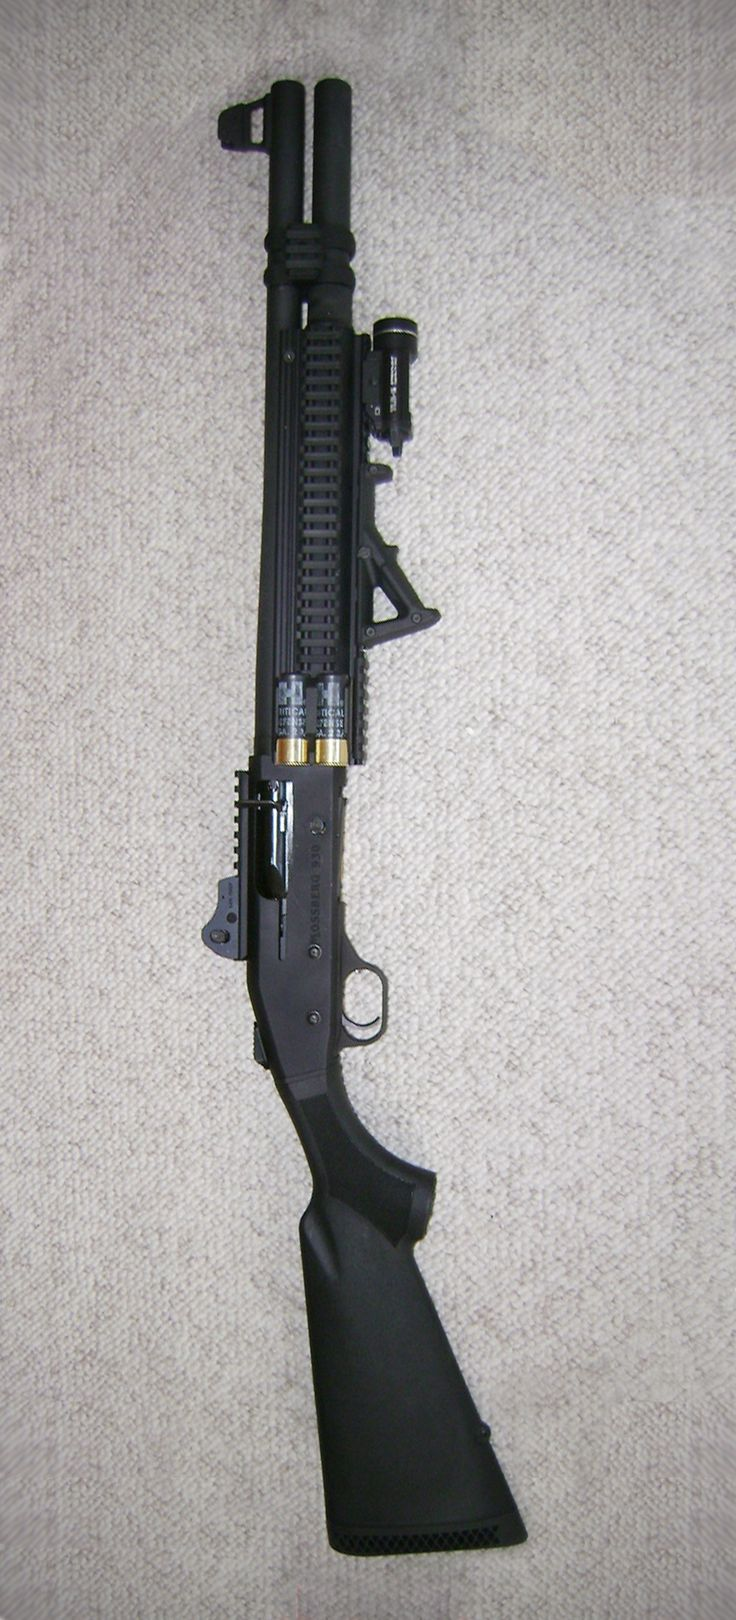 Mossberg 930 SPX; mods: Nordic mag extension, magpul afg, Aimpro tri-rail, Side armor 2 shell holder, Streamlight TLR-1